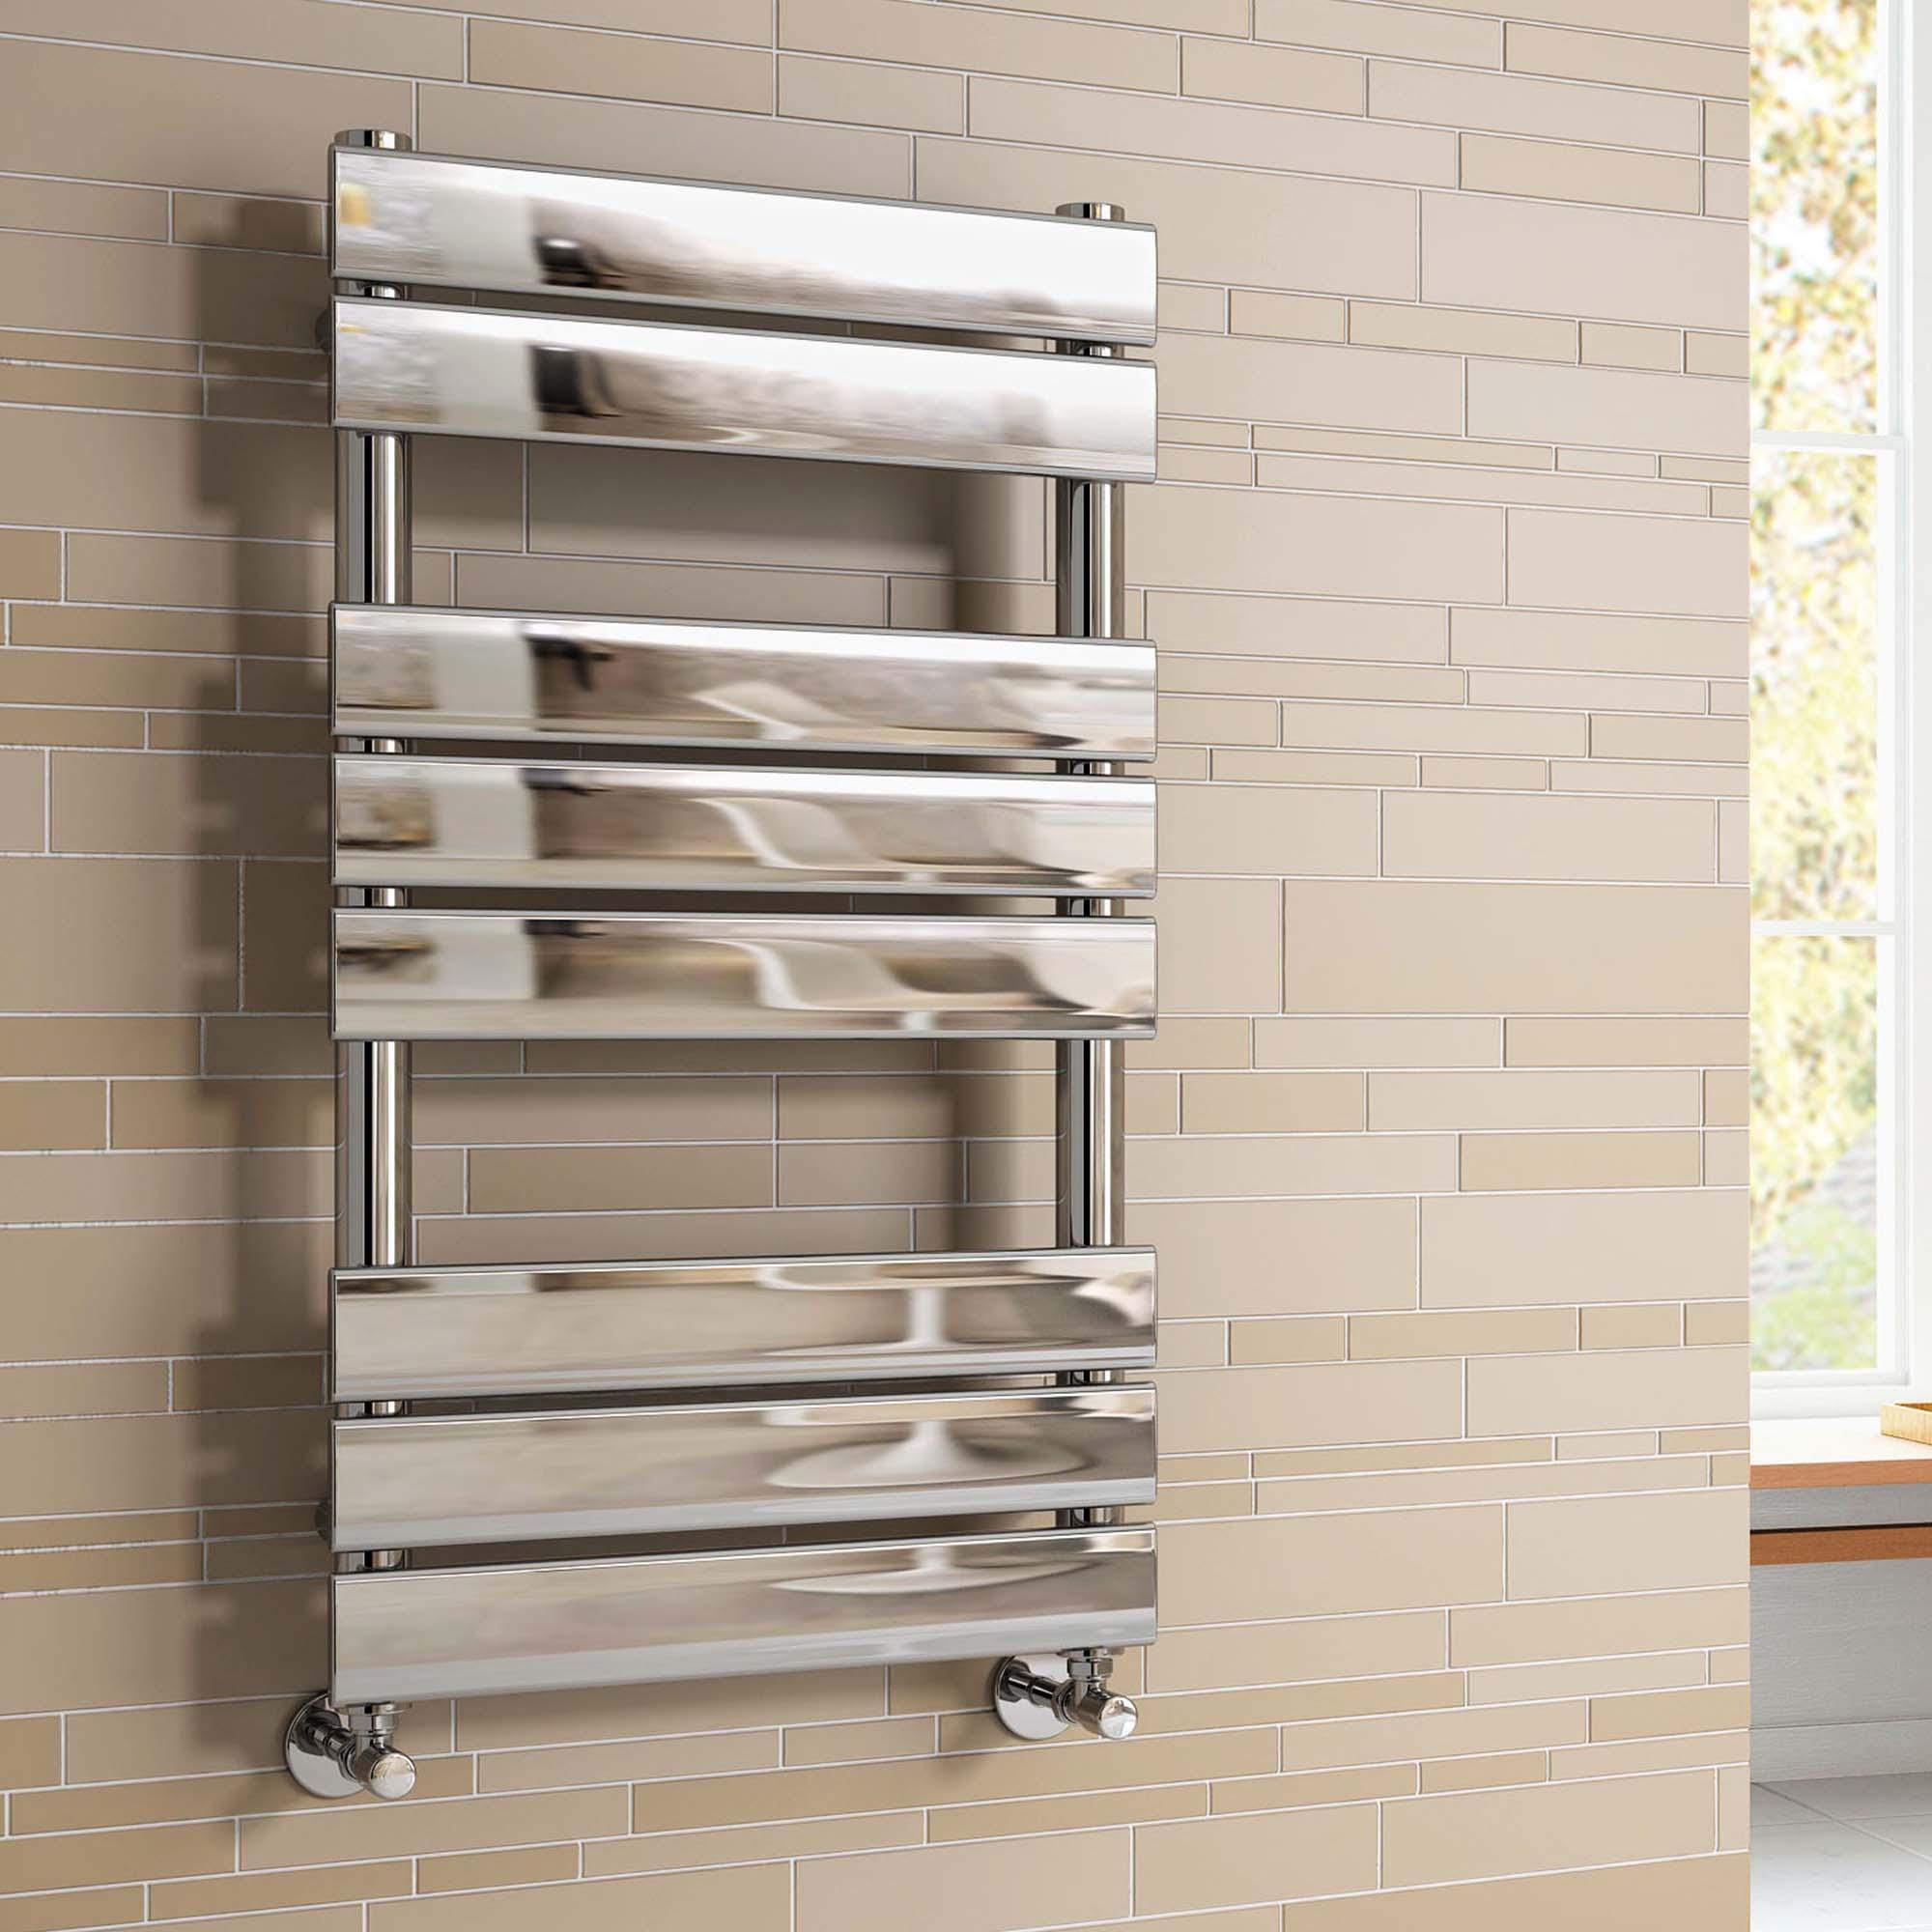 Natasha ladder rail straight modern electric towel radiator in chrome - Chrome Heated Towel Rail Bathroom Designer Radiator 800x450mm